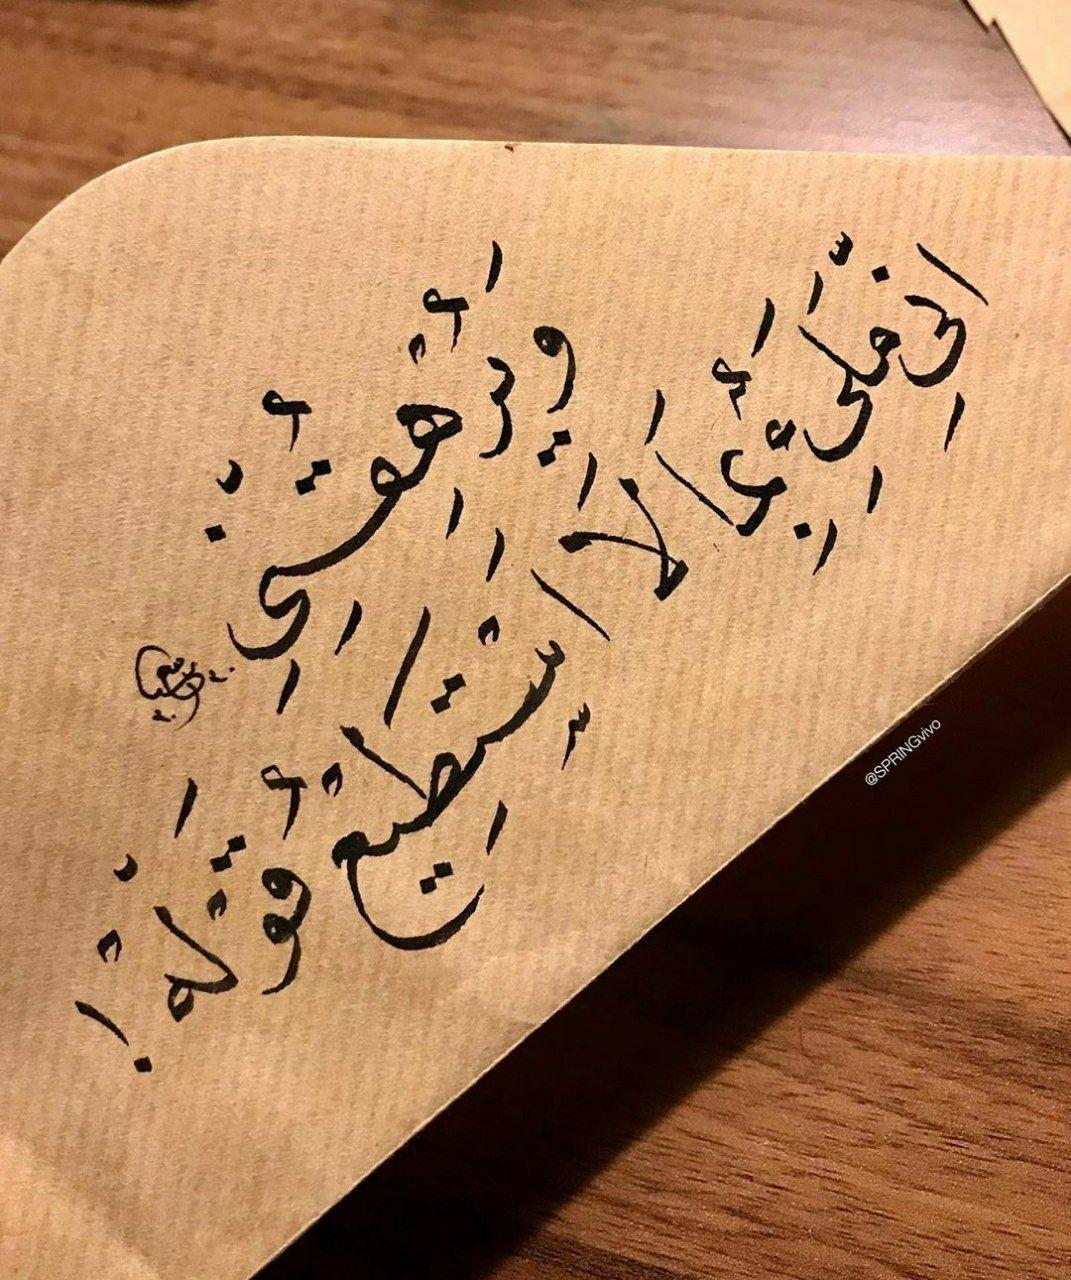 Pin By فارس العهد الأخير On الخط العربي Calligraphy Arabic Calligraphy Art